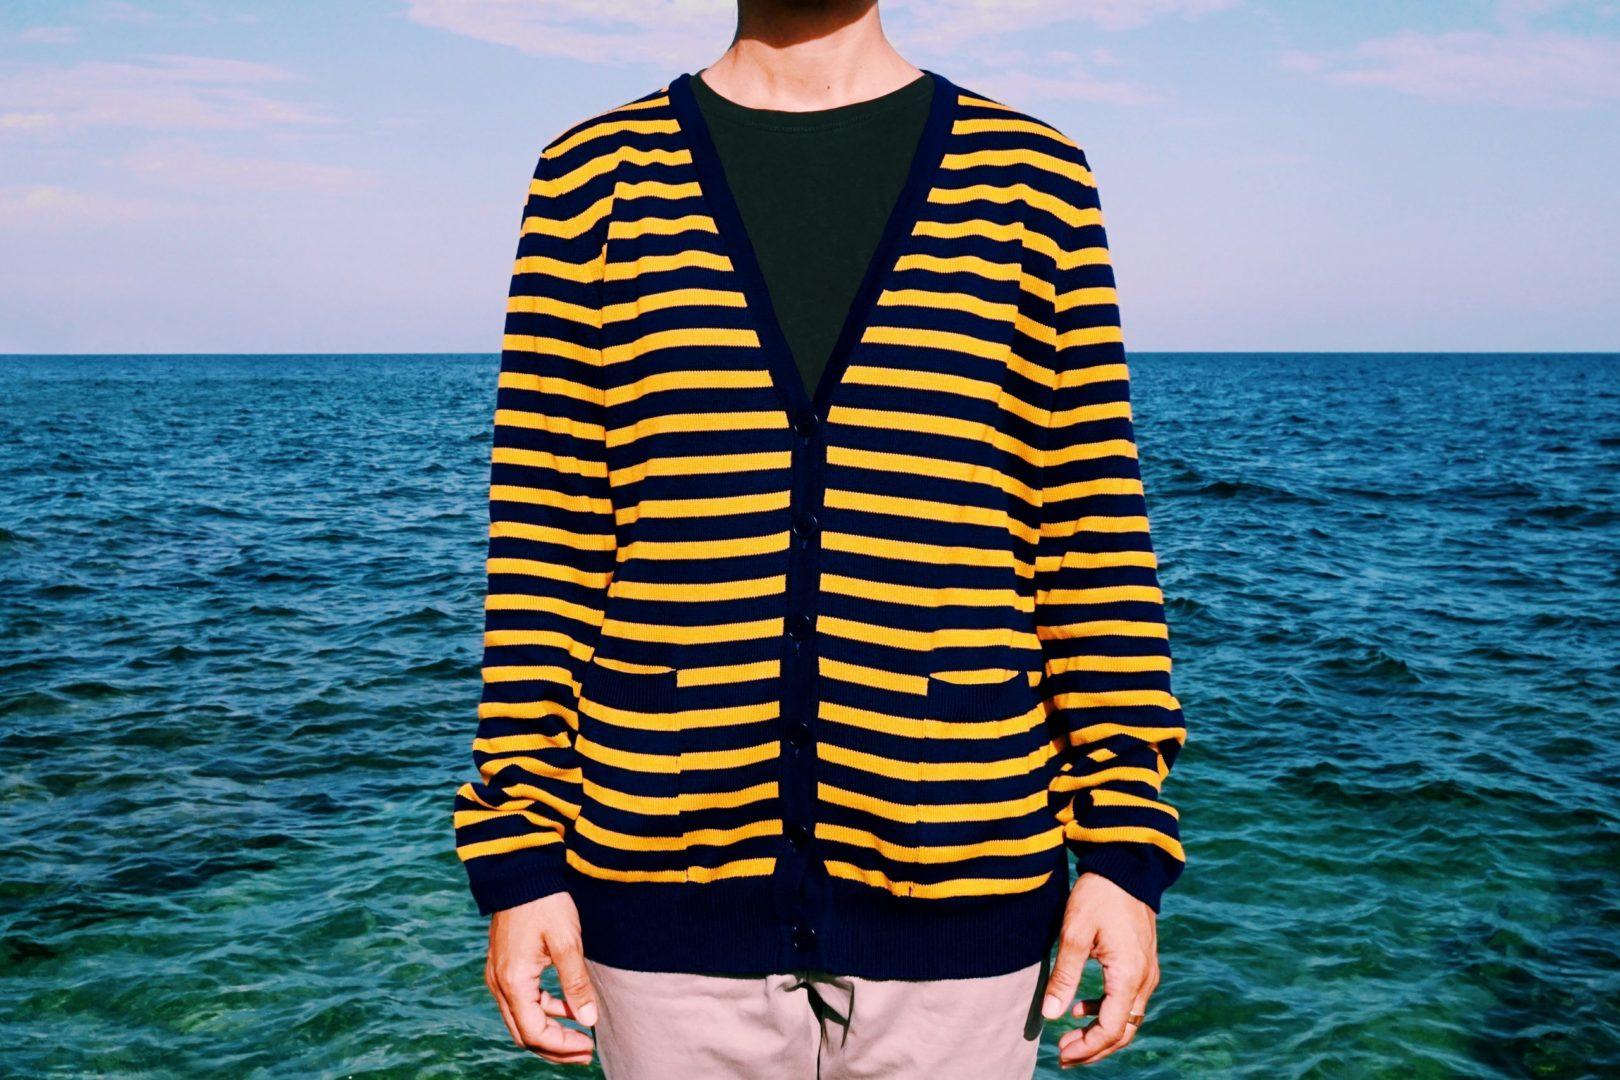 Delta sailor stripes